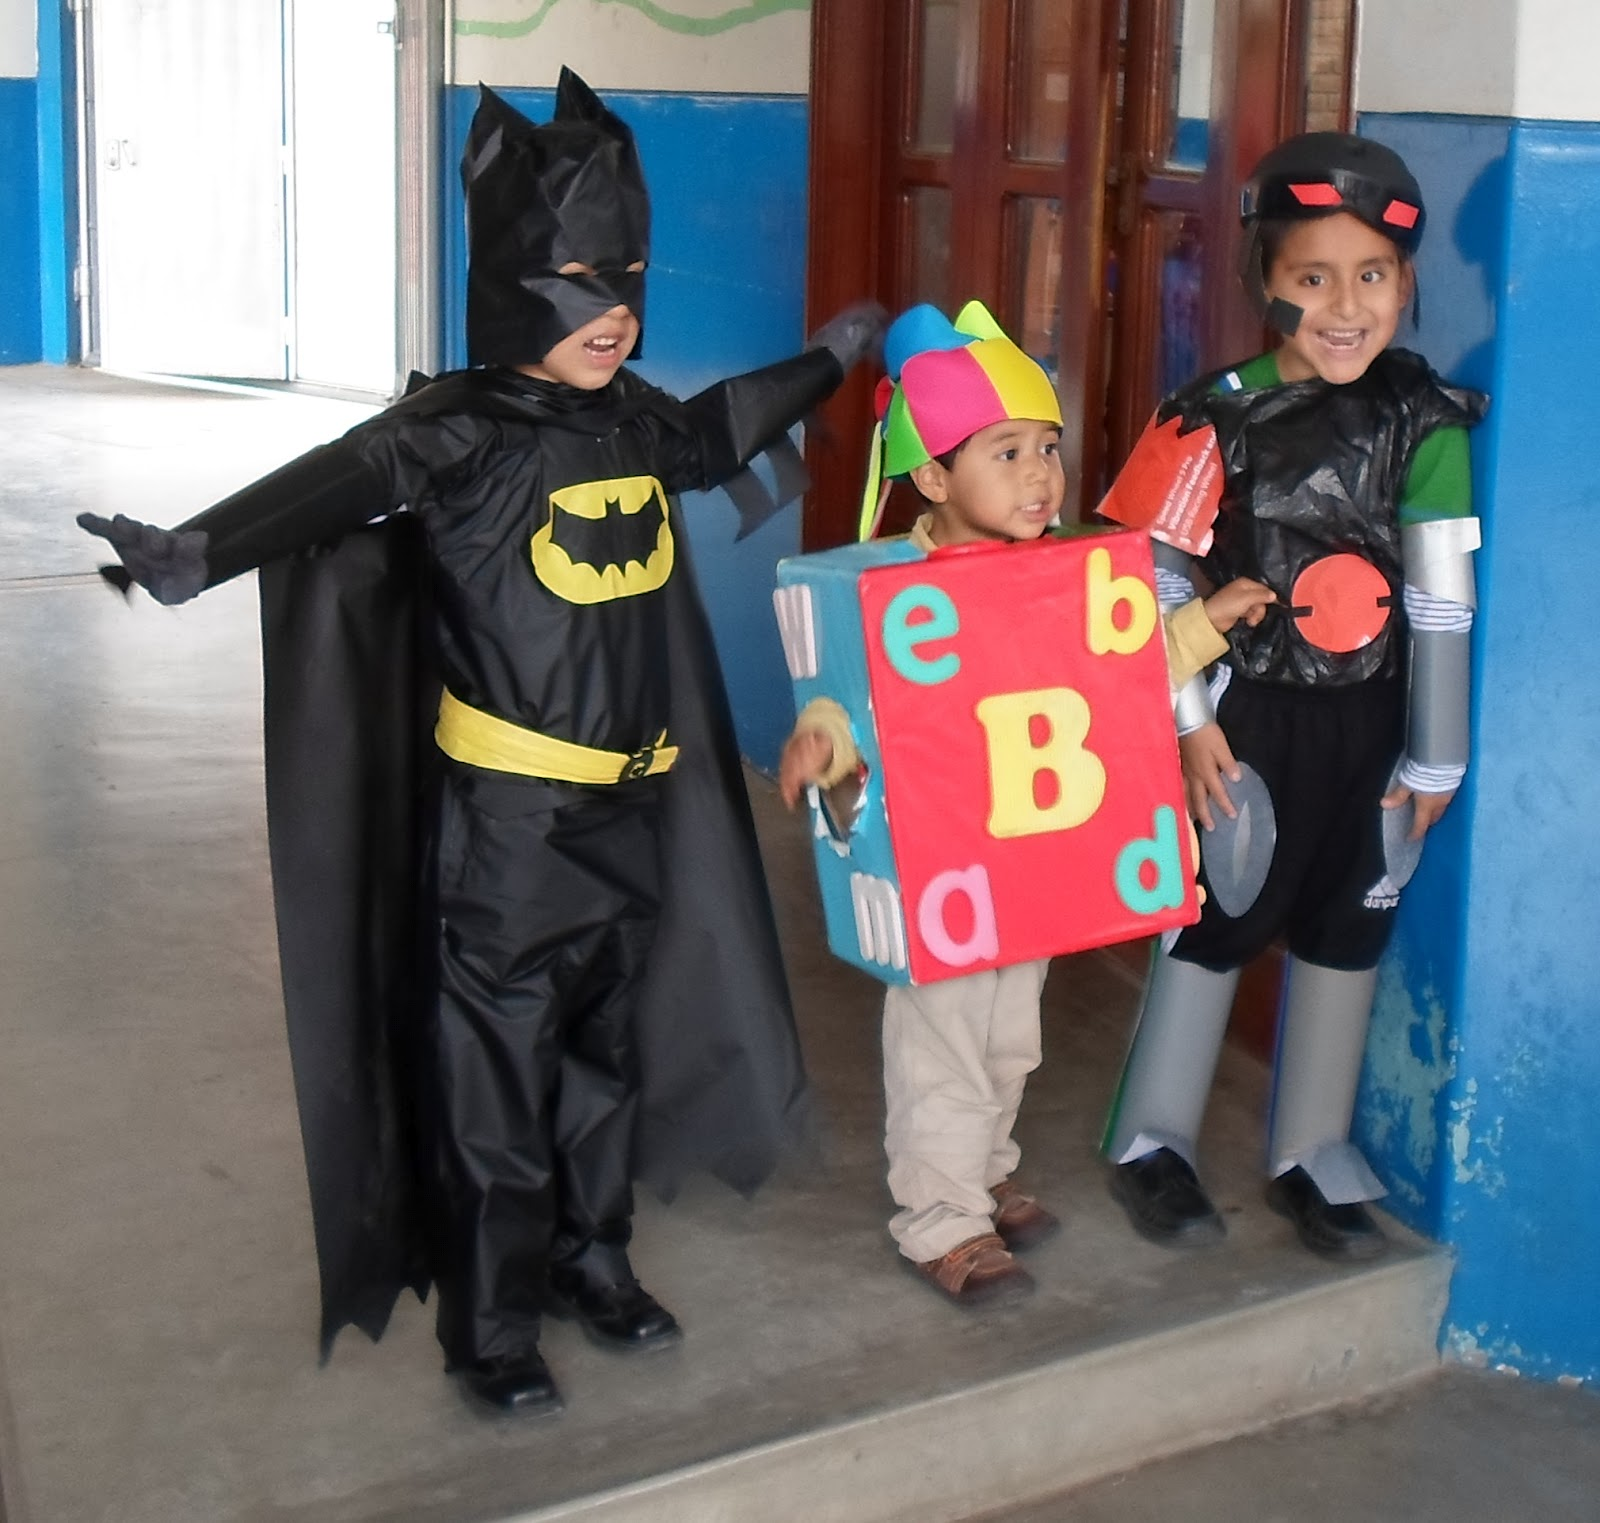 Disfraz reciclable para niñas - Imagui